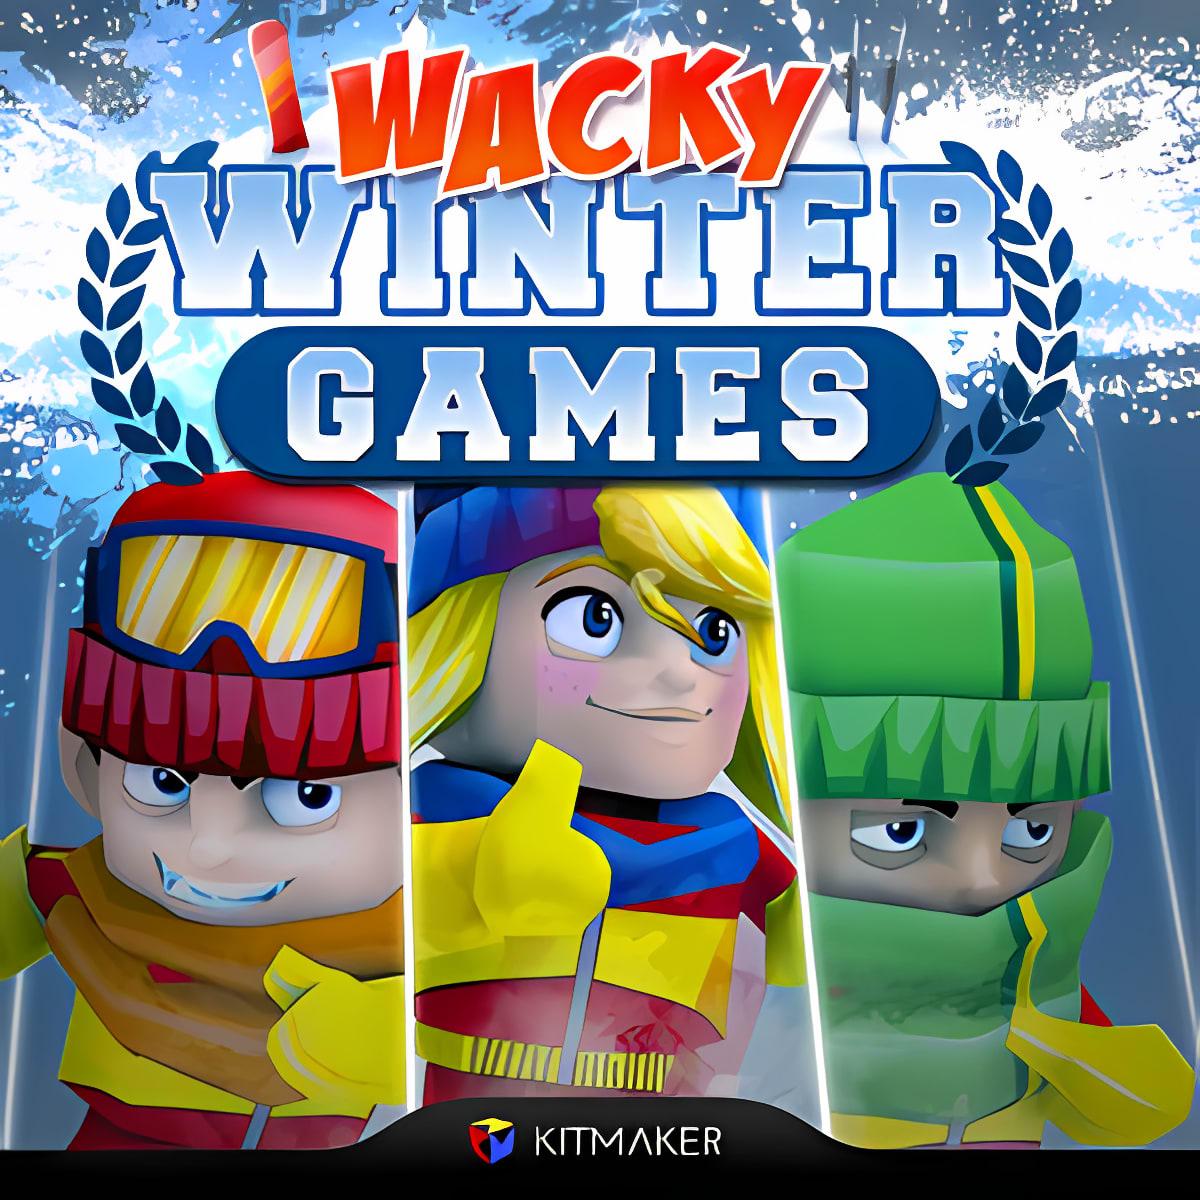 Wacky Winter Games